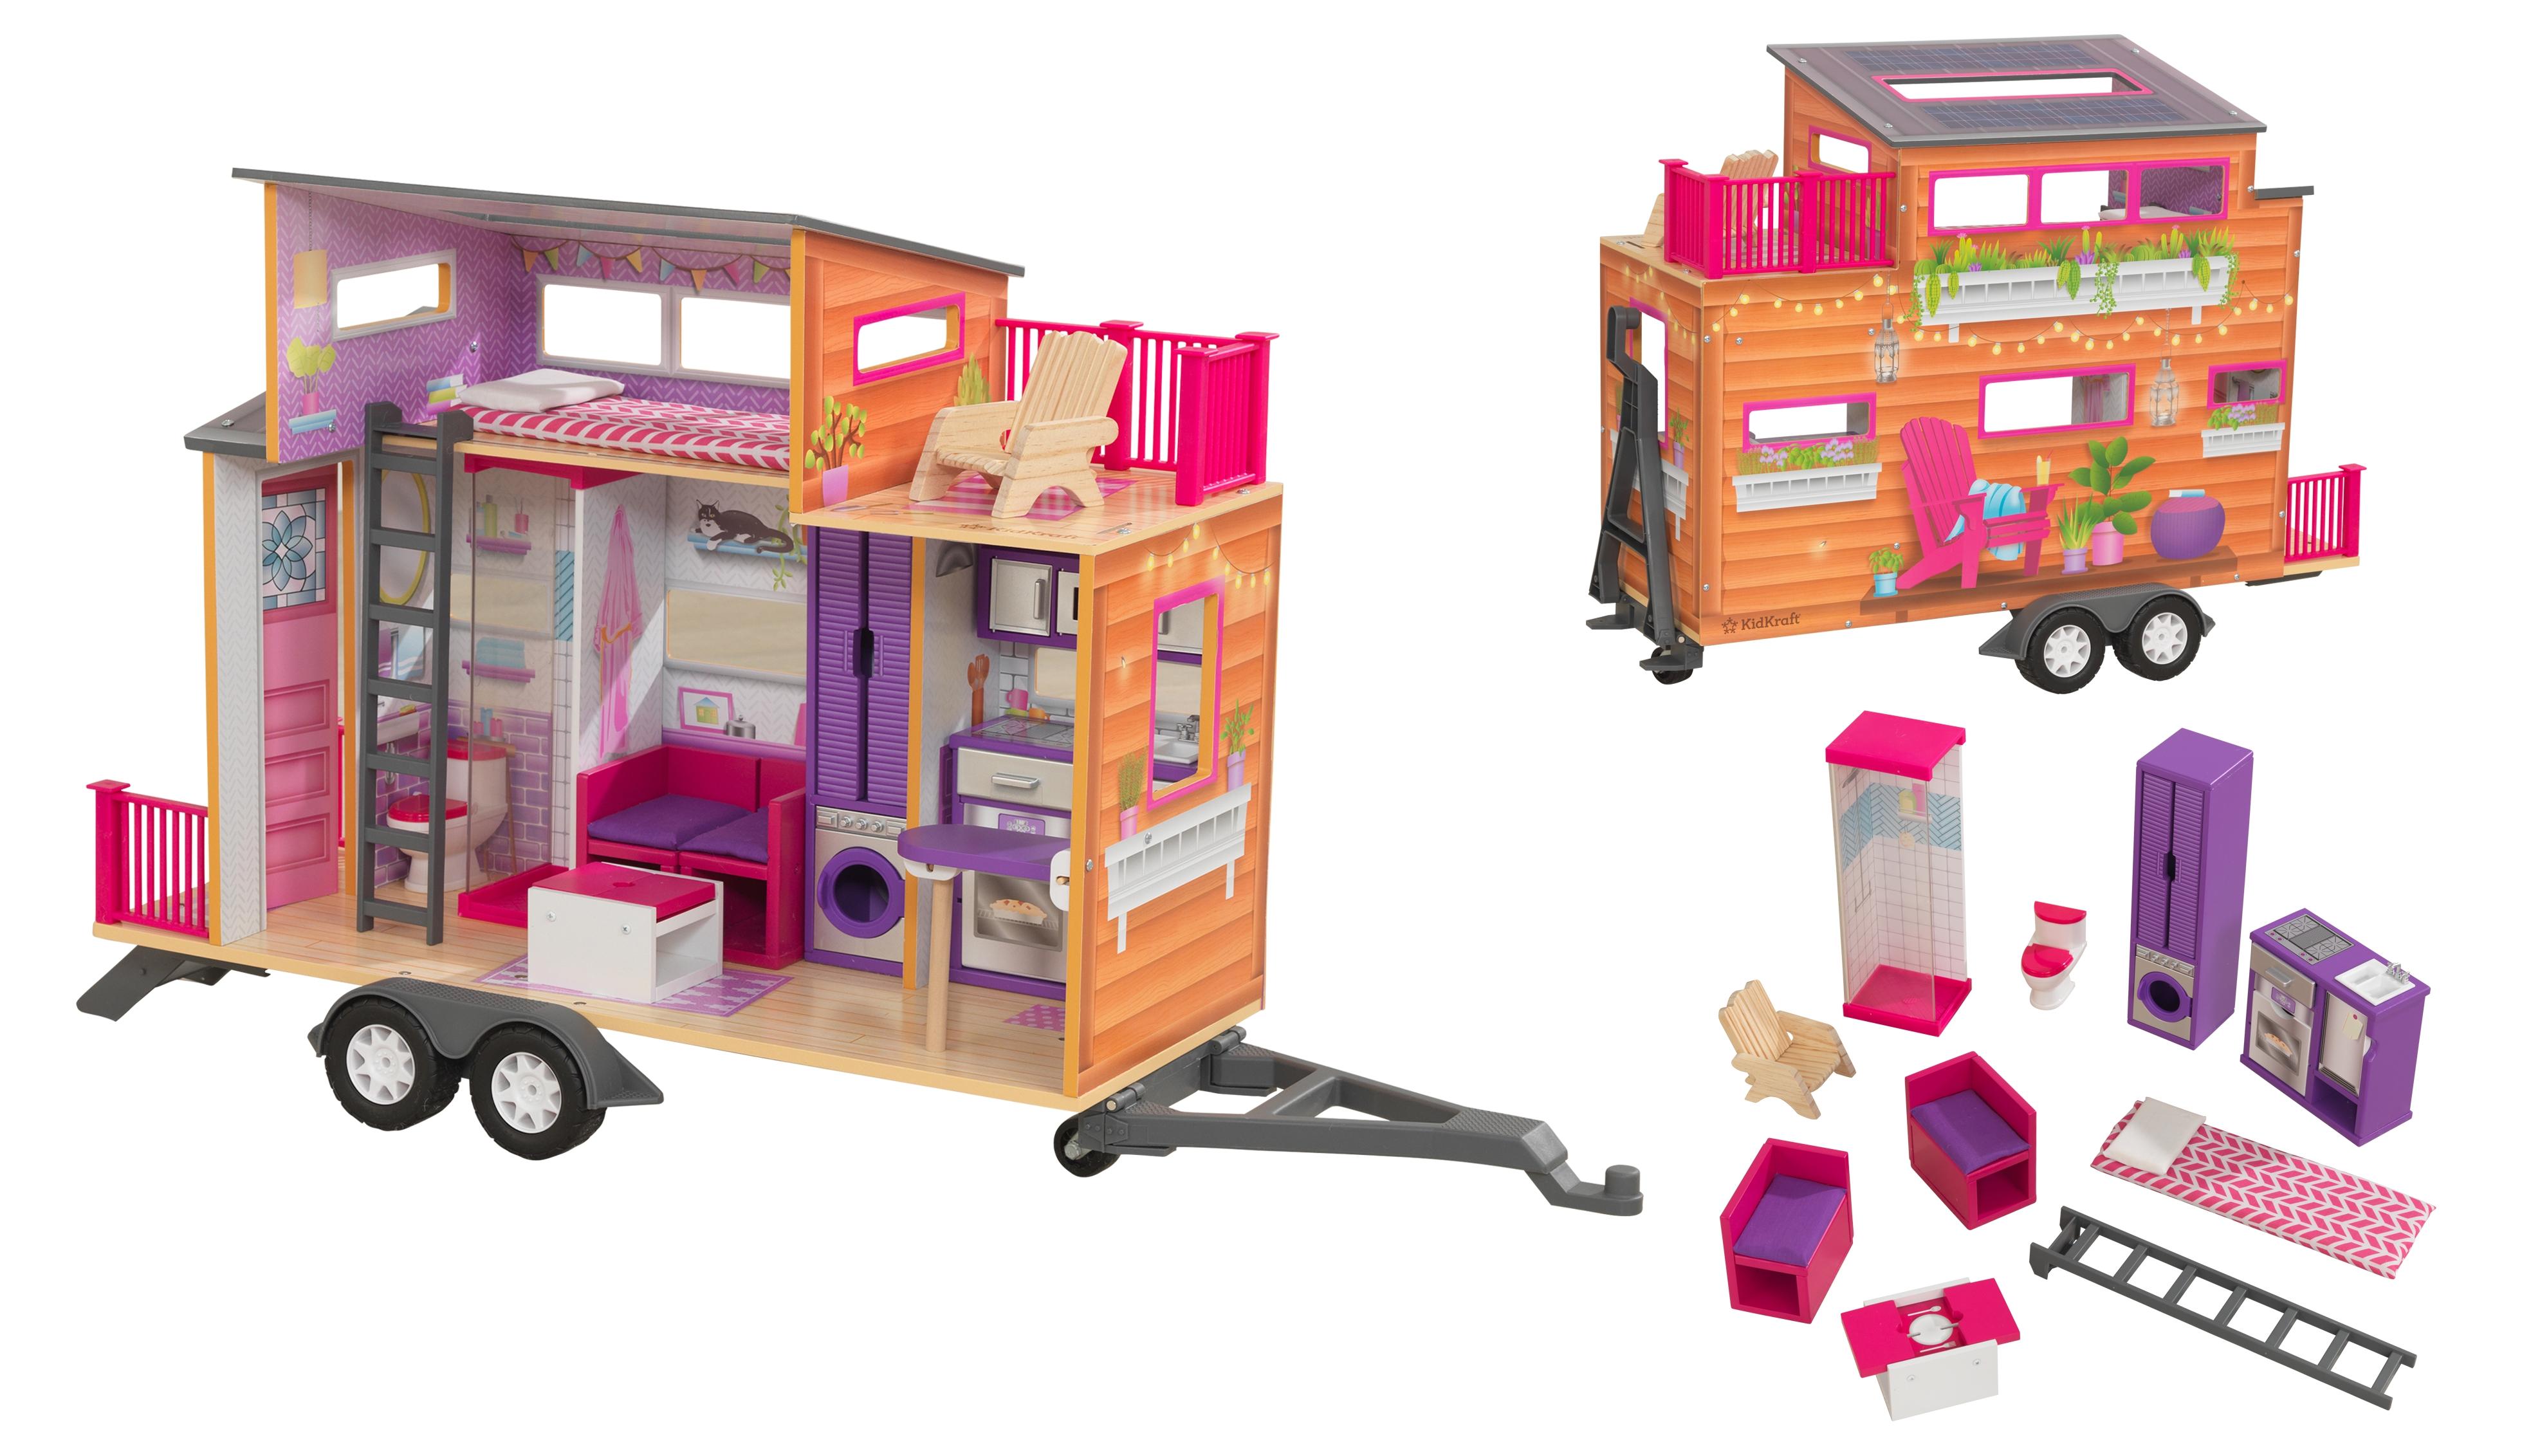 Kidkraft Celebrates 50 Years Of Imaginative Play Business Wire